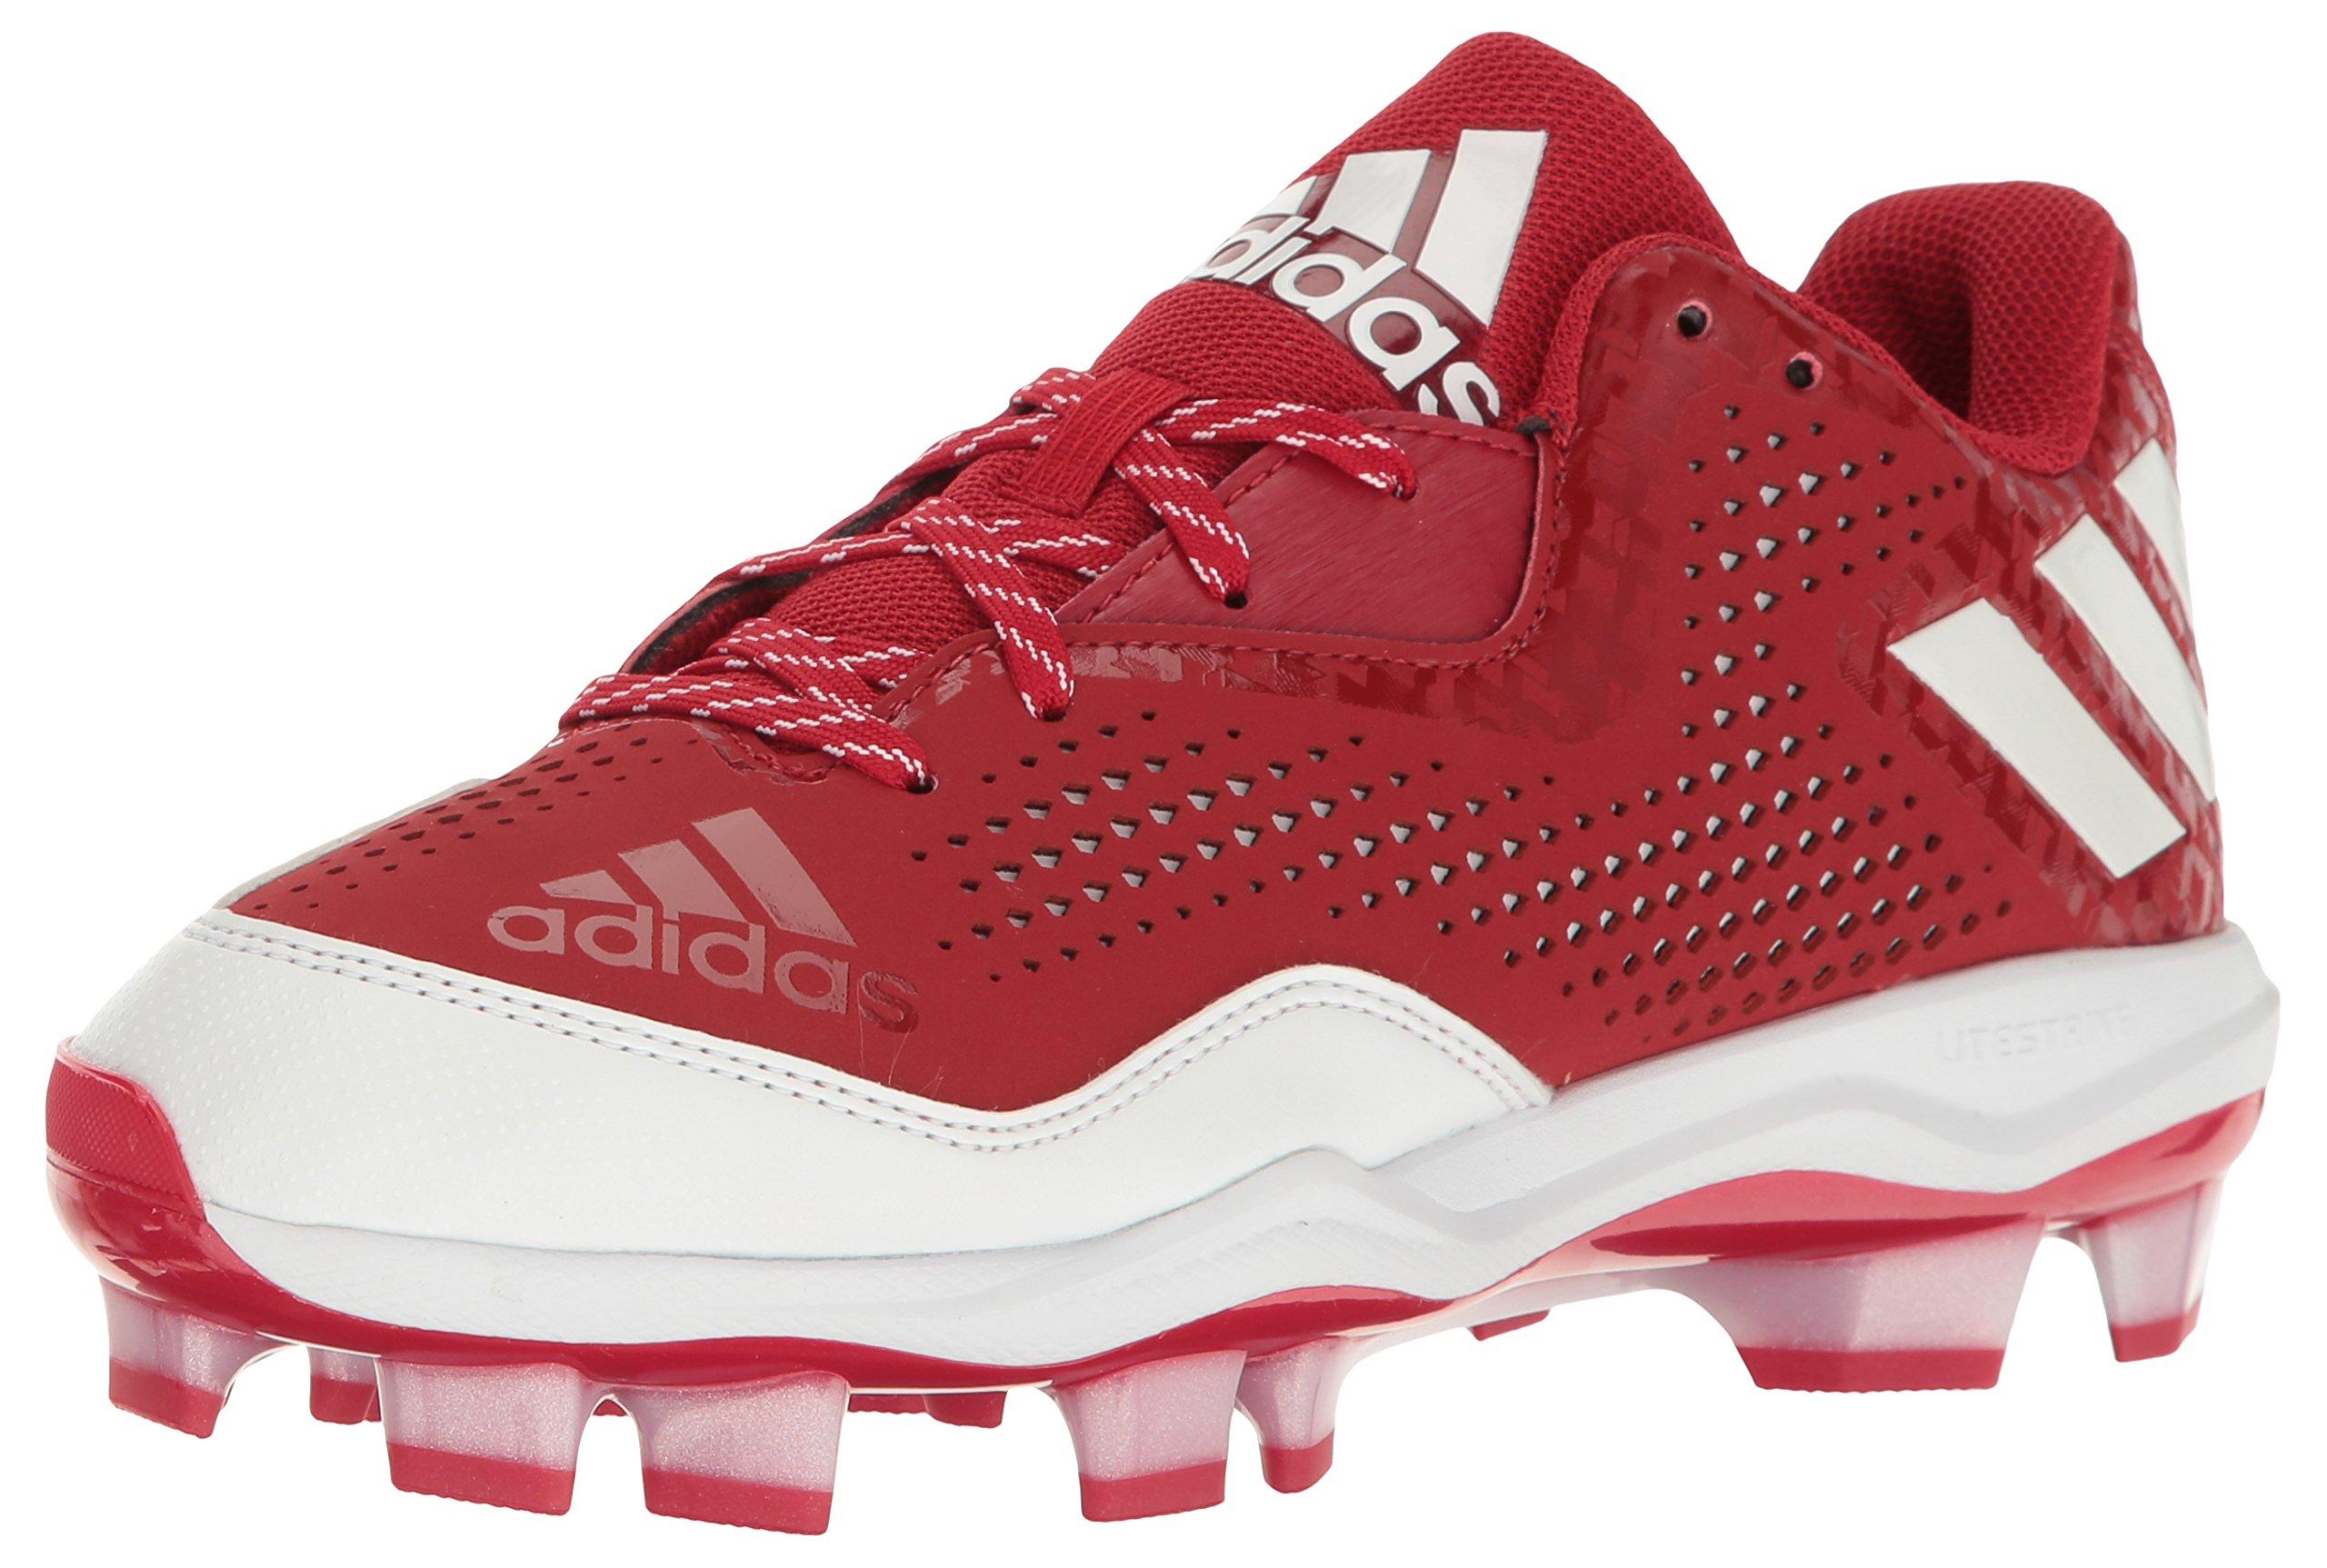 adidas Women's PowerAlley 4 W TPU Baseball Shoe, Power Red/White/White, 11 M US